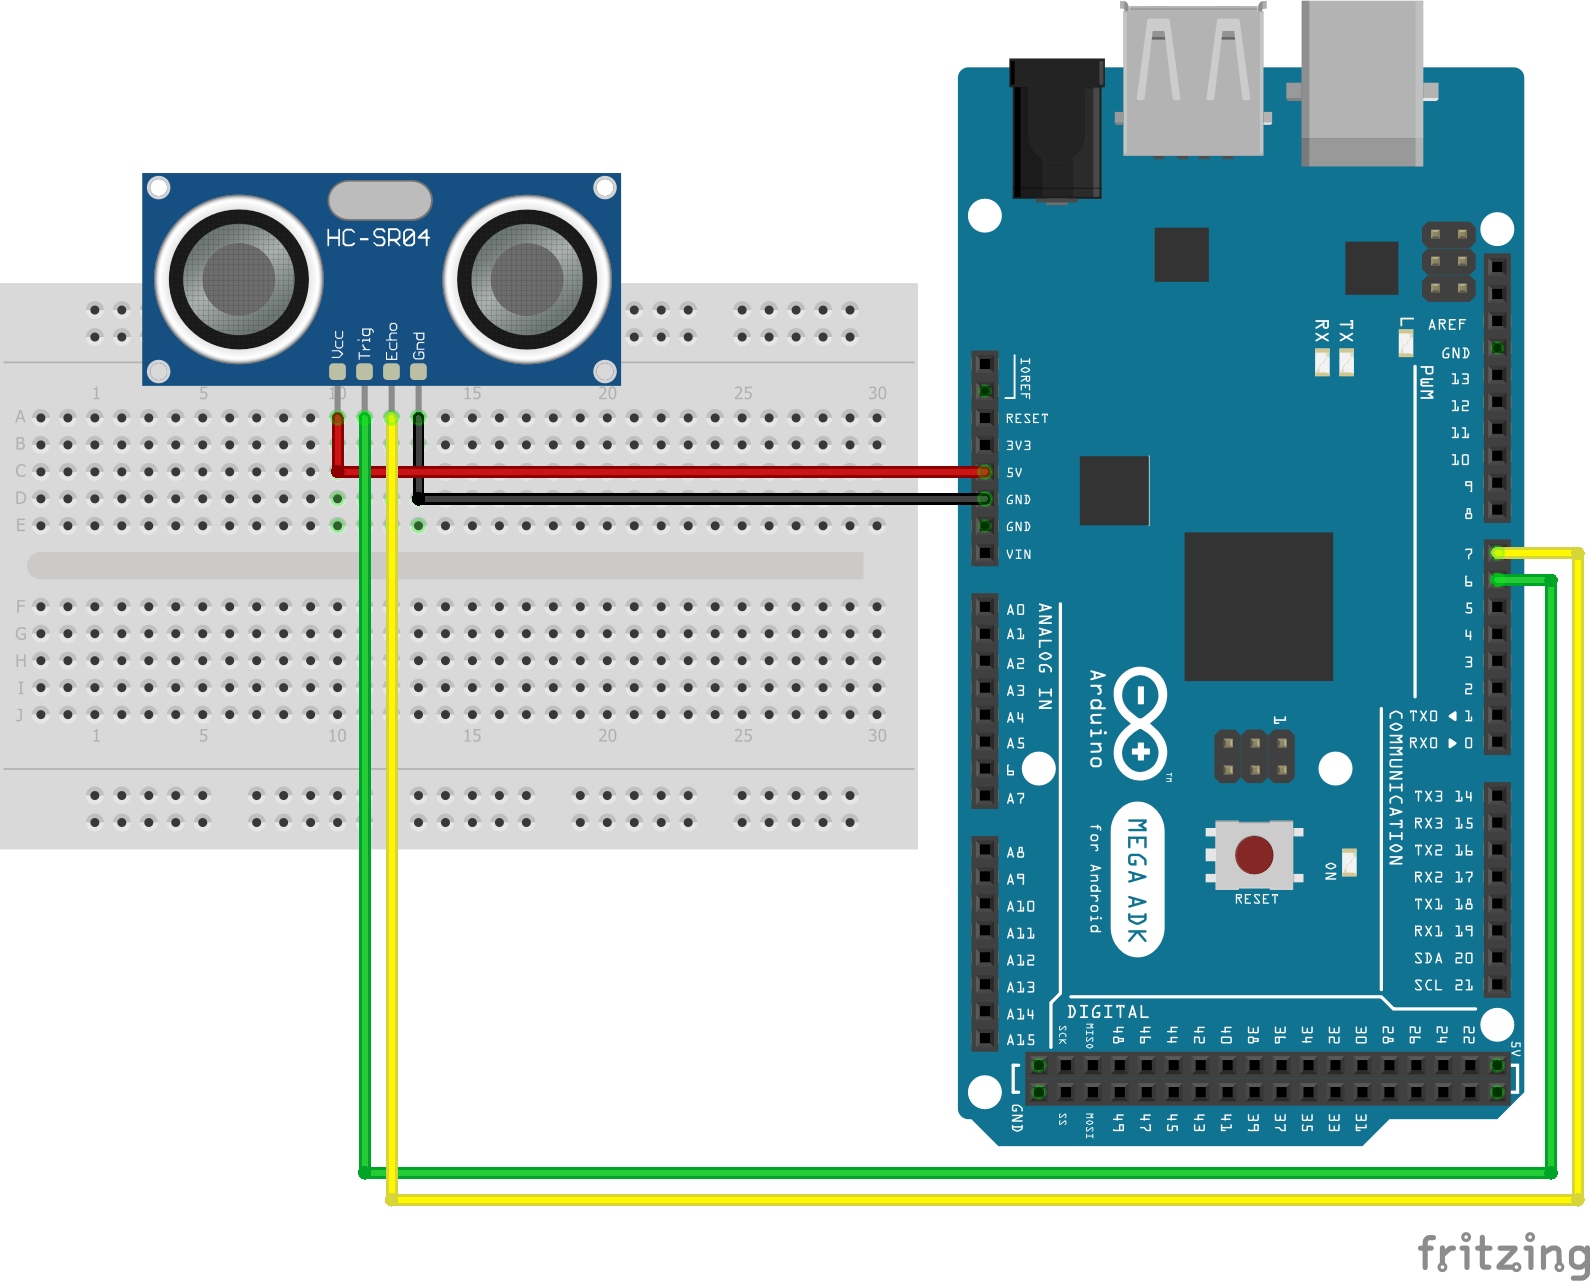 Wiring HC-SR04 Ultrasonic Distance Sensor Arduino Mega